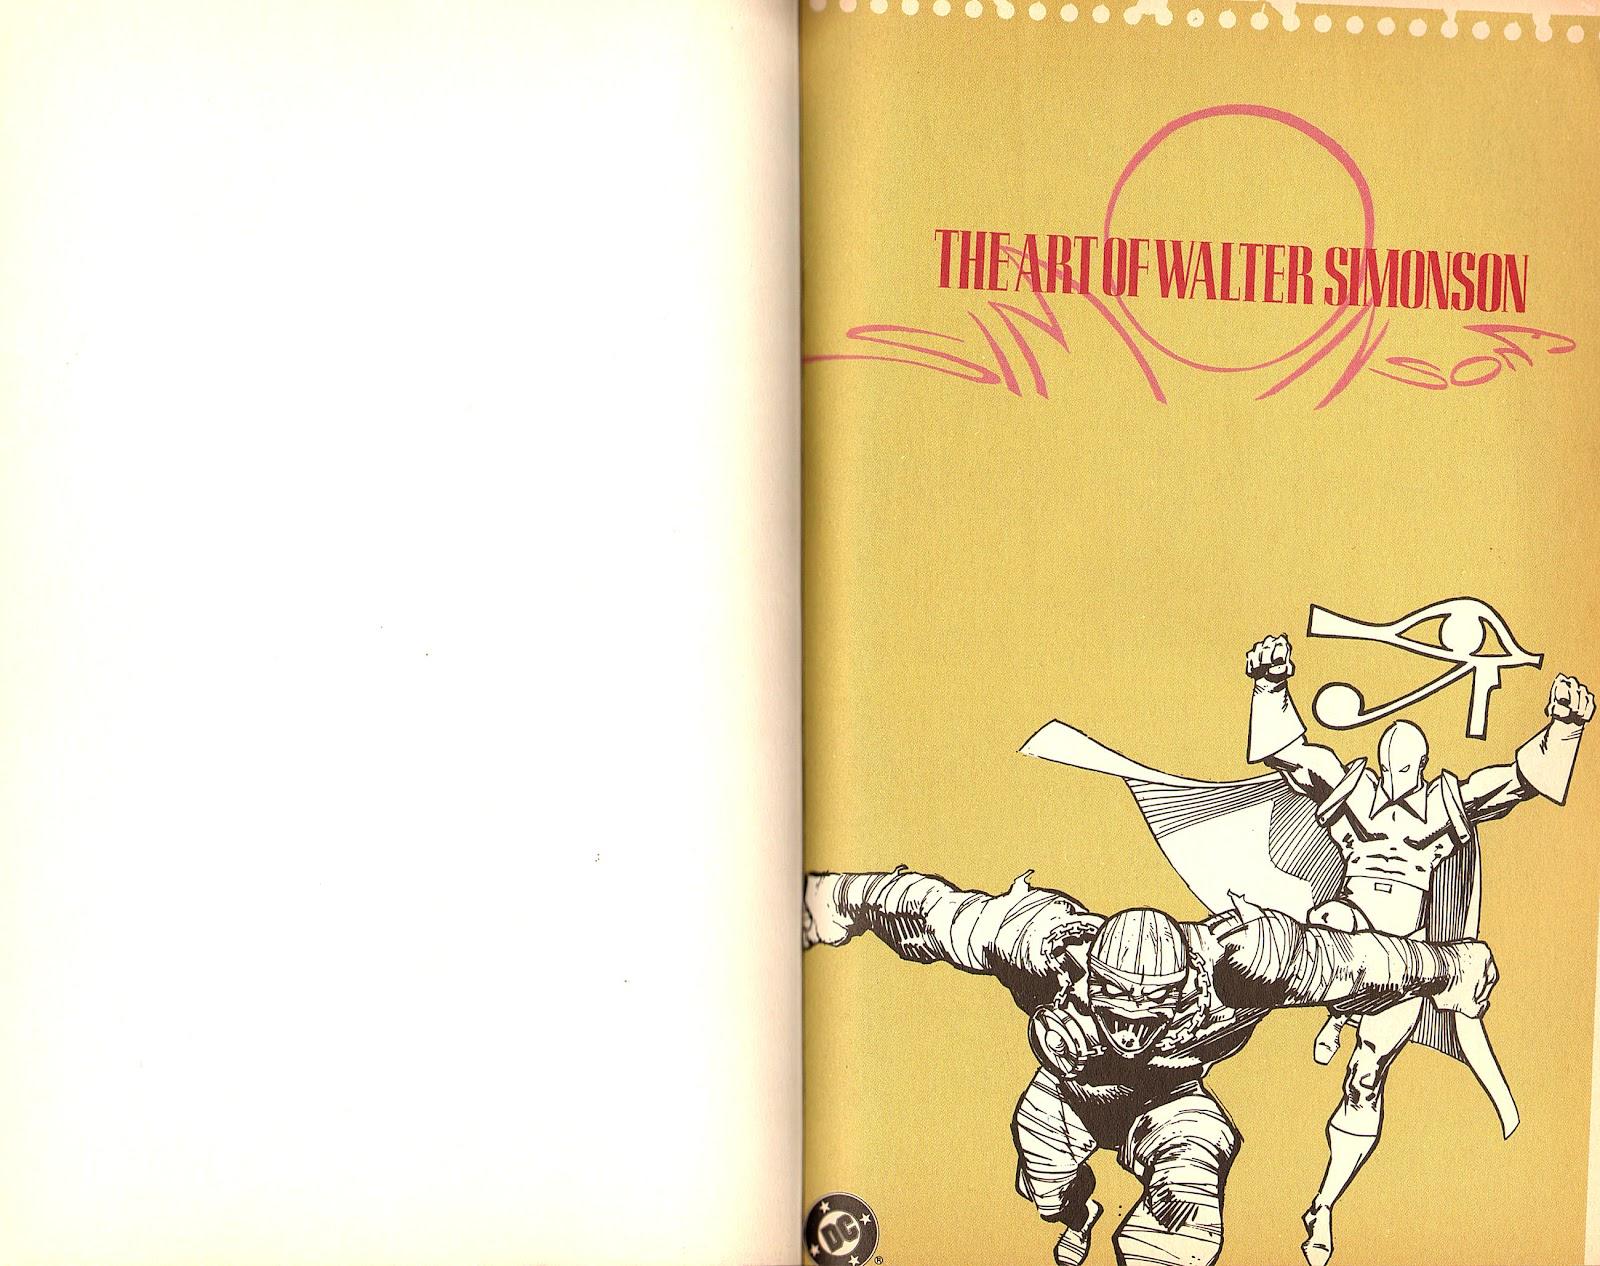 Read online The Art of Walter Simonson comic -  Issue # TPB - 2